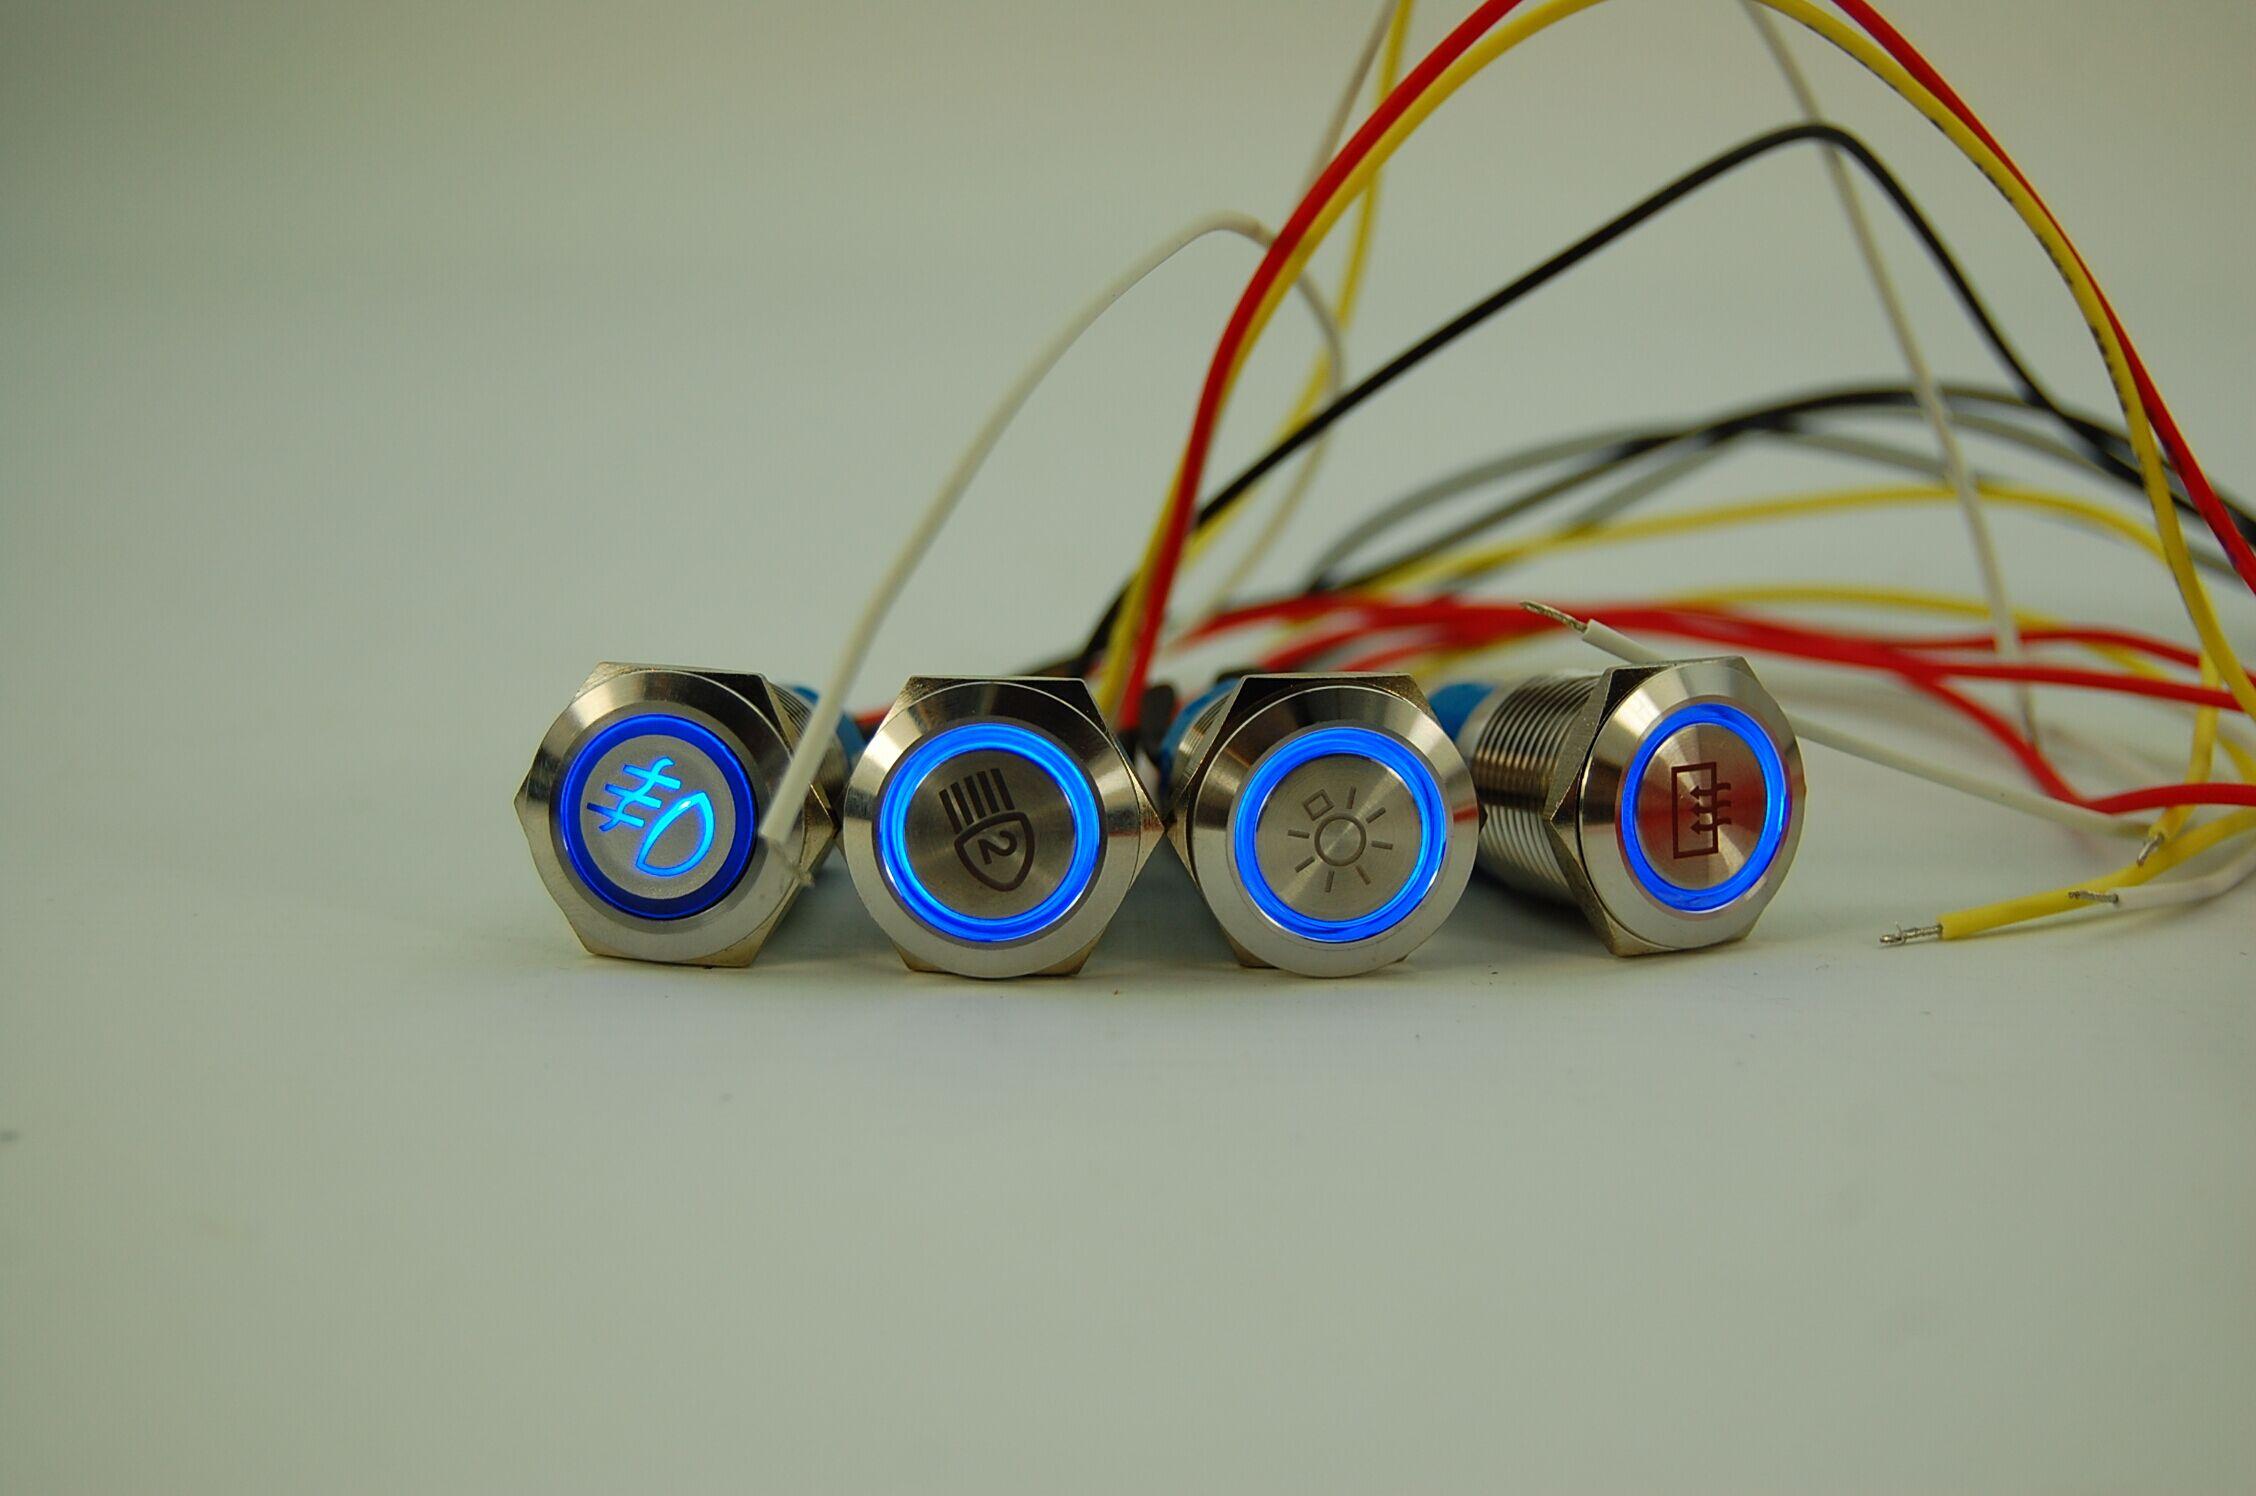 Indicatorlight 19mm Push Button Switch With Illuminated Symbol Schematic